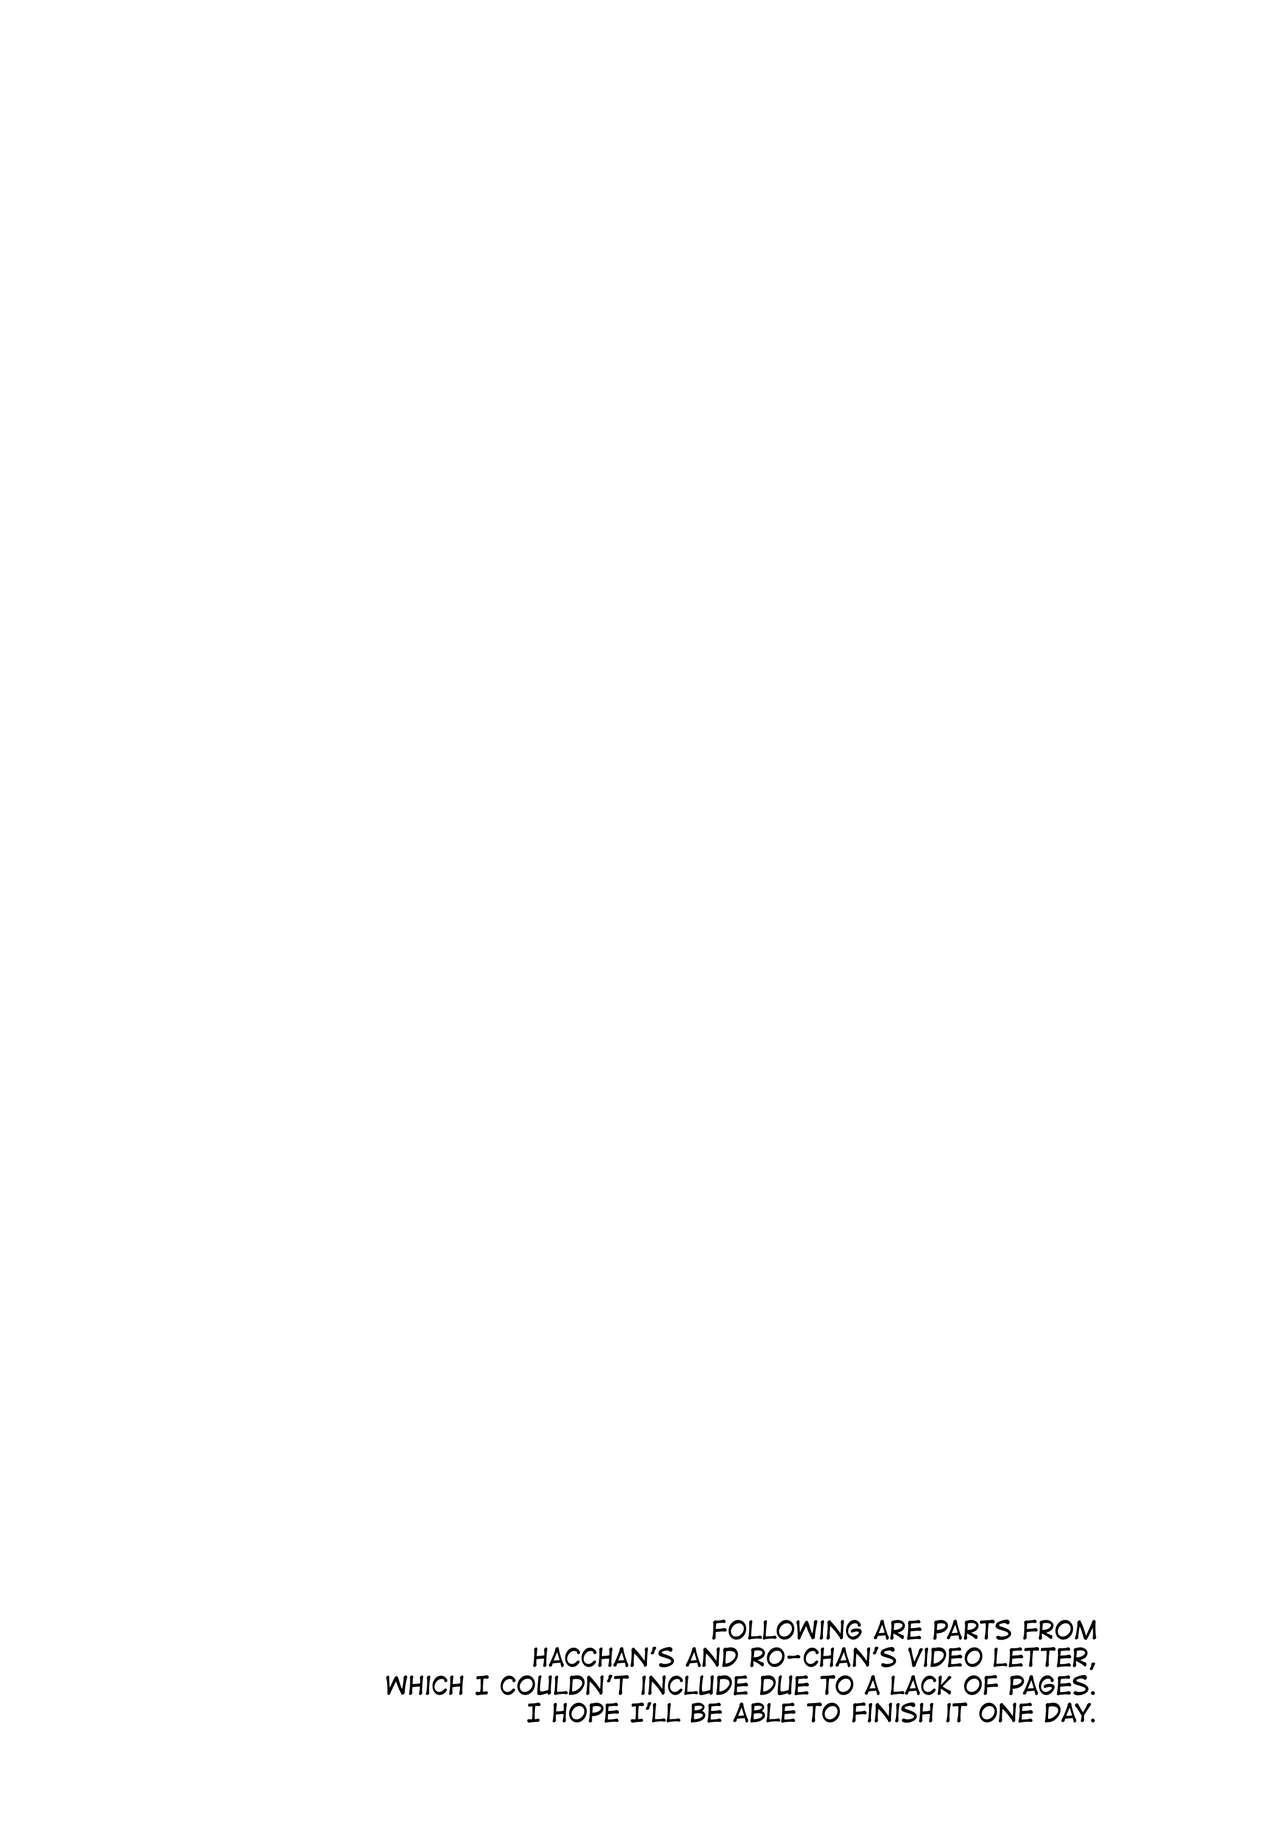 (CSP6) [squeezecandyheaven (Ichihaya)] Shinjite Okuridashita U-511 Ga...Ikaryaku | The U-511 They Trusted Out Was... -Omitted- (Kantai Collection -KanColle-) [English] [ATF] 12